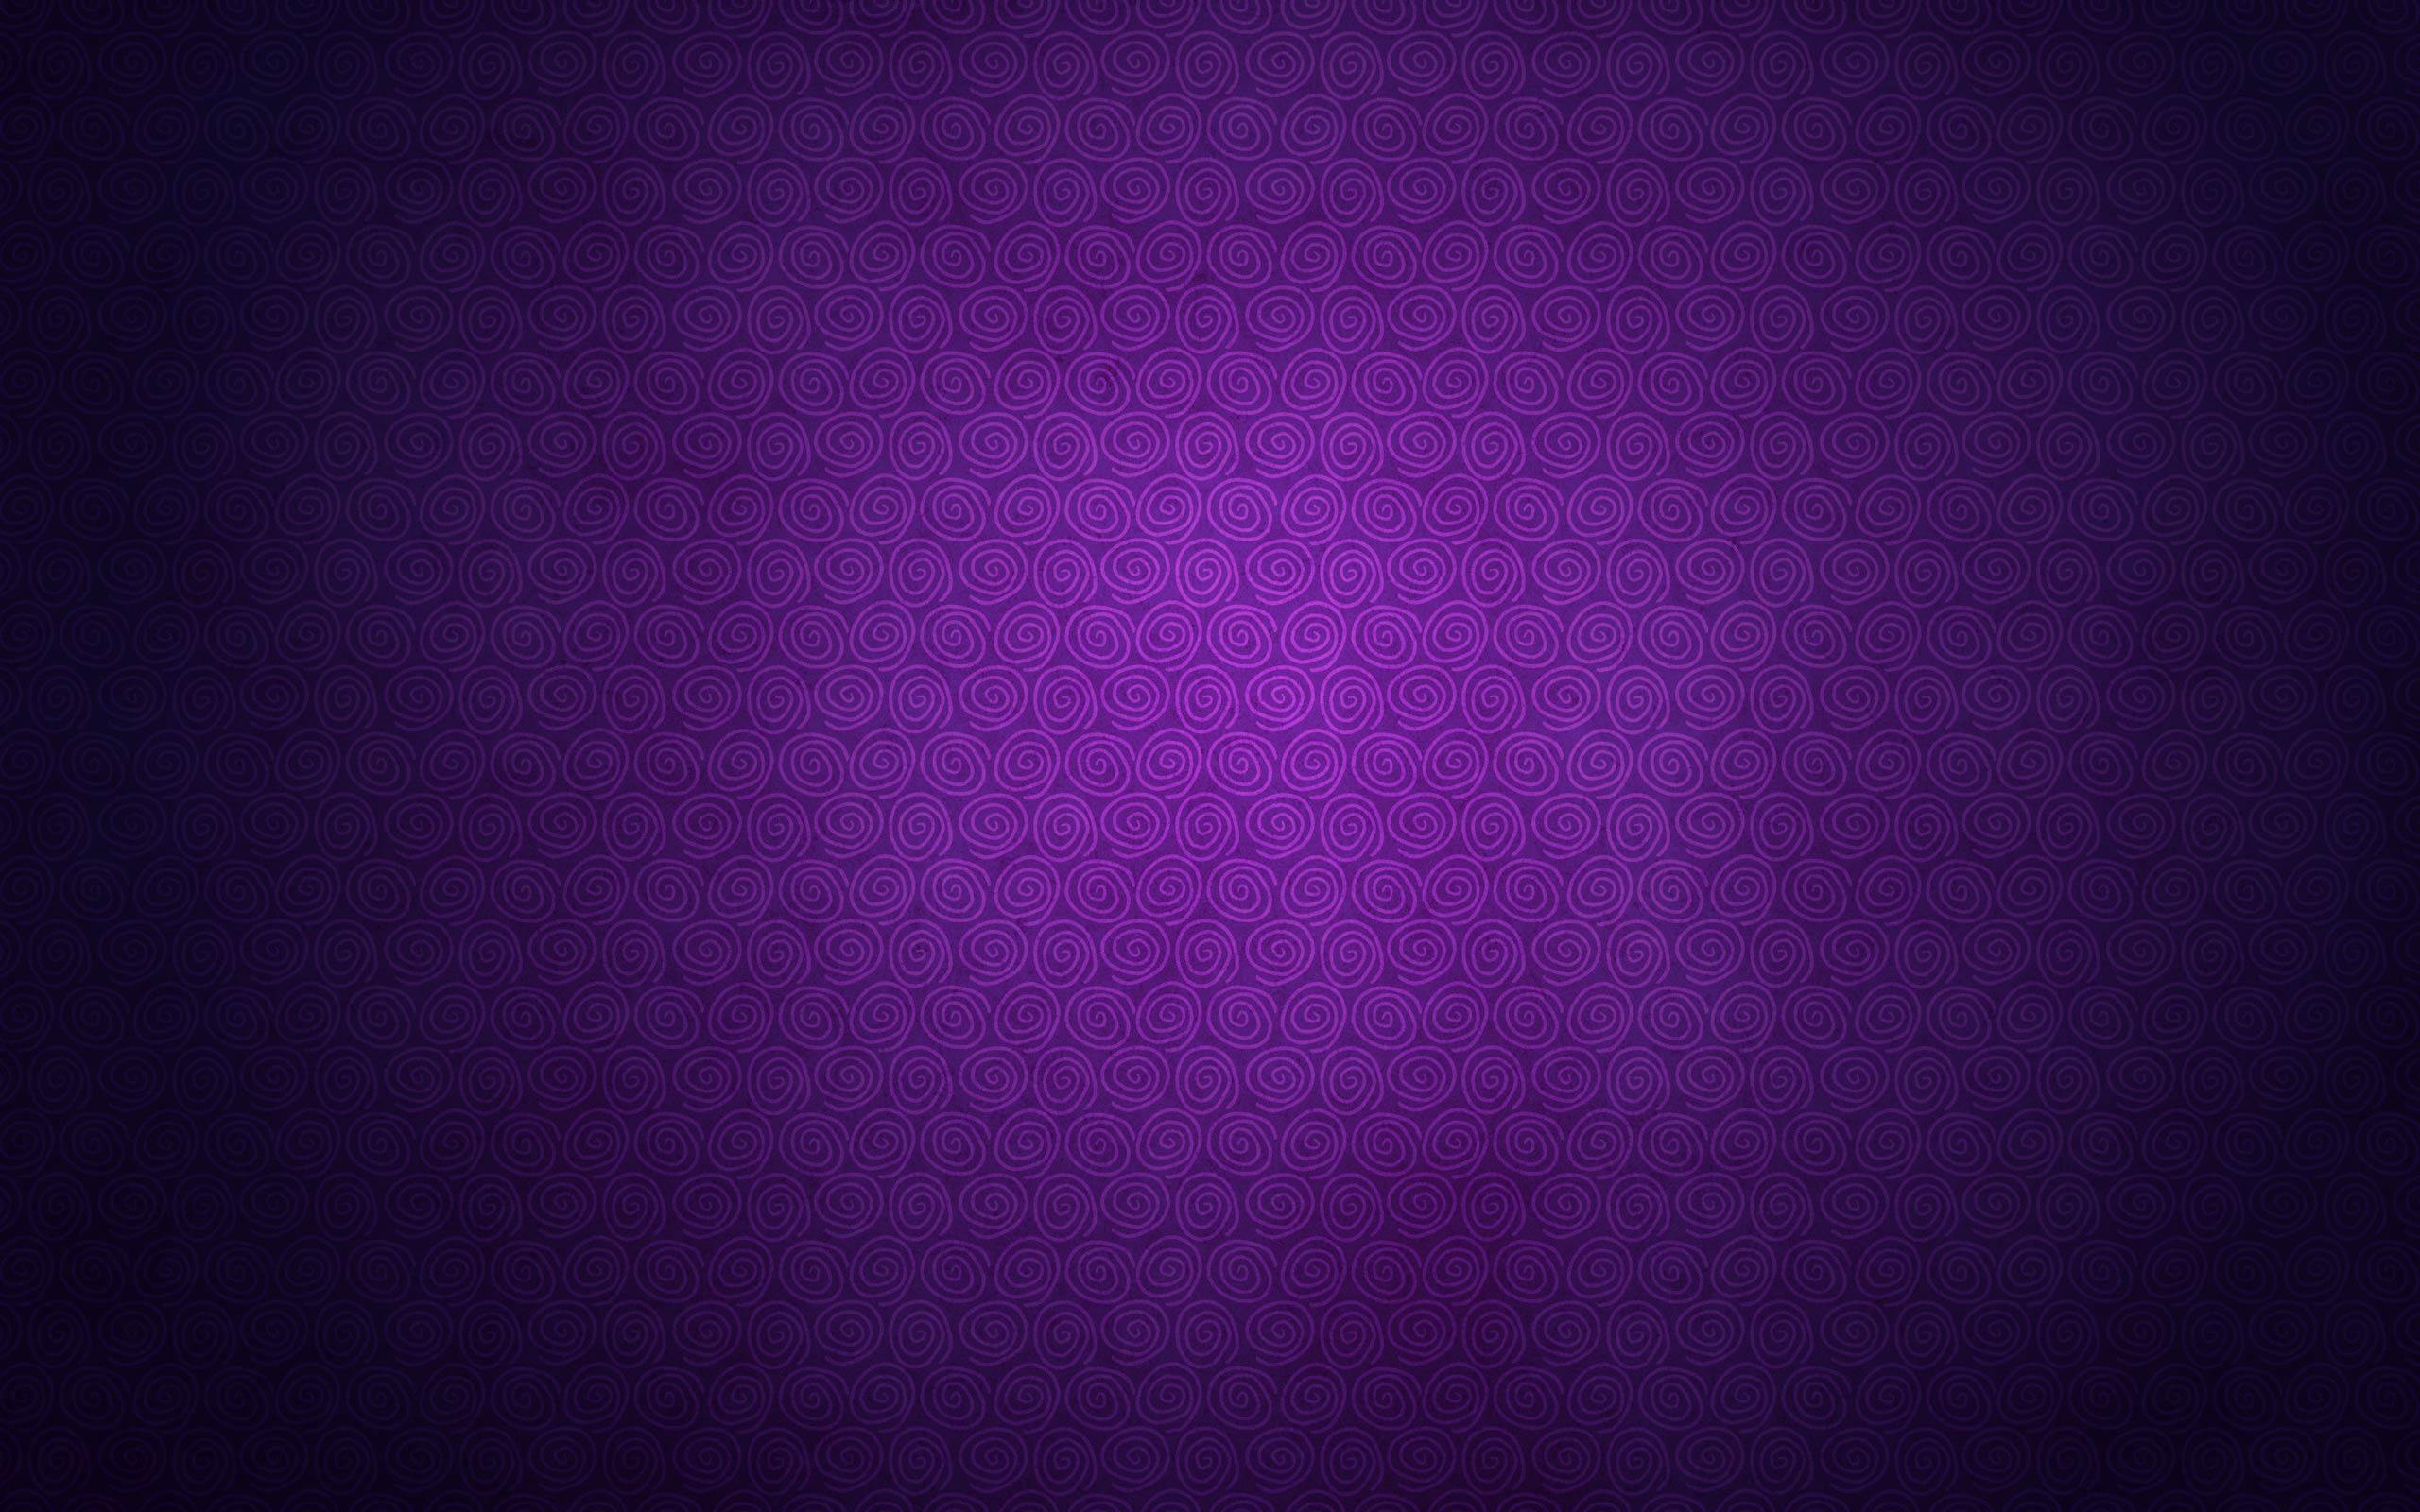 Related Cool Christian Cross Wallpaper Dark Cross Background 2560x1600